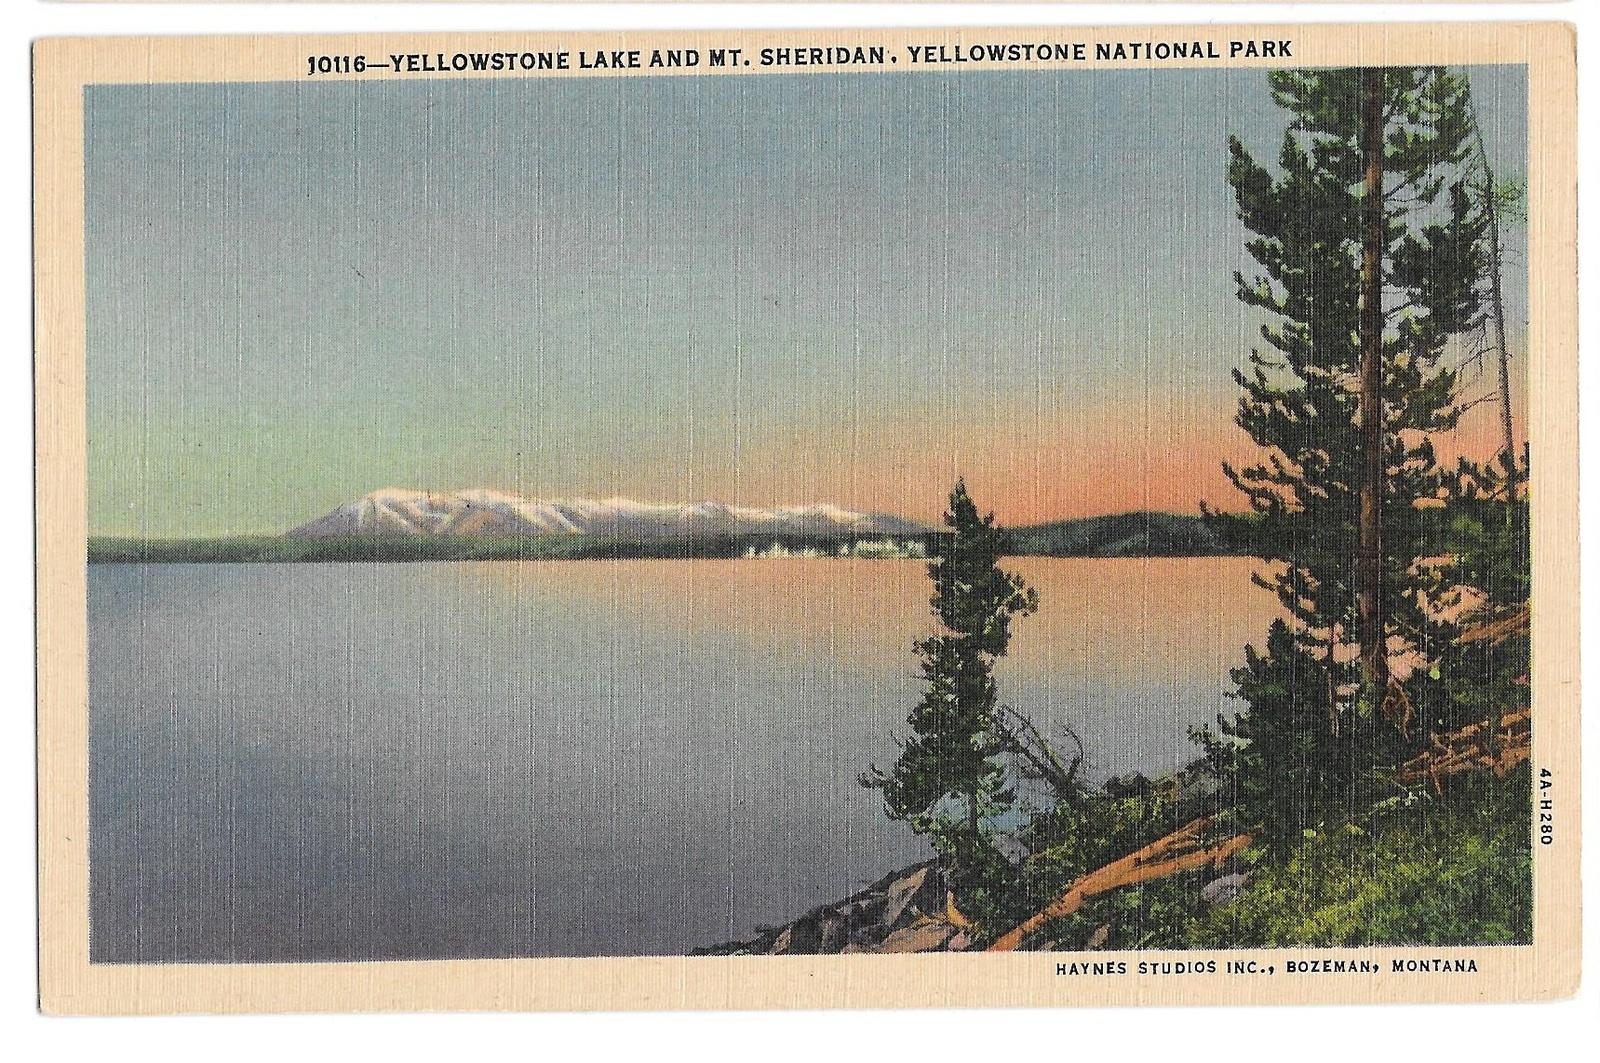 99 br 1925 1bx yellowstone lake mount sheridan haynes studios inc 2